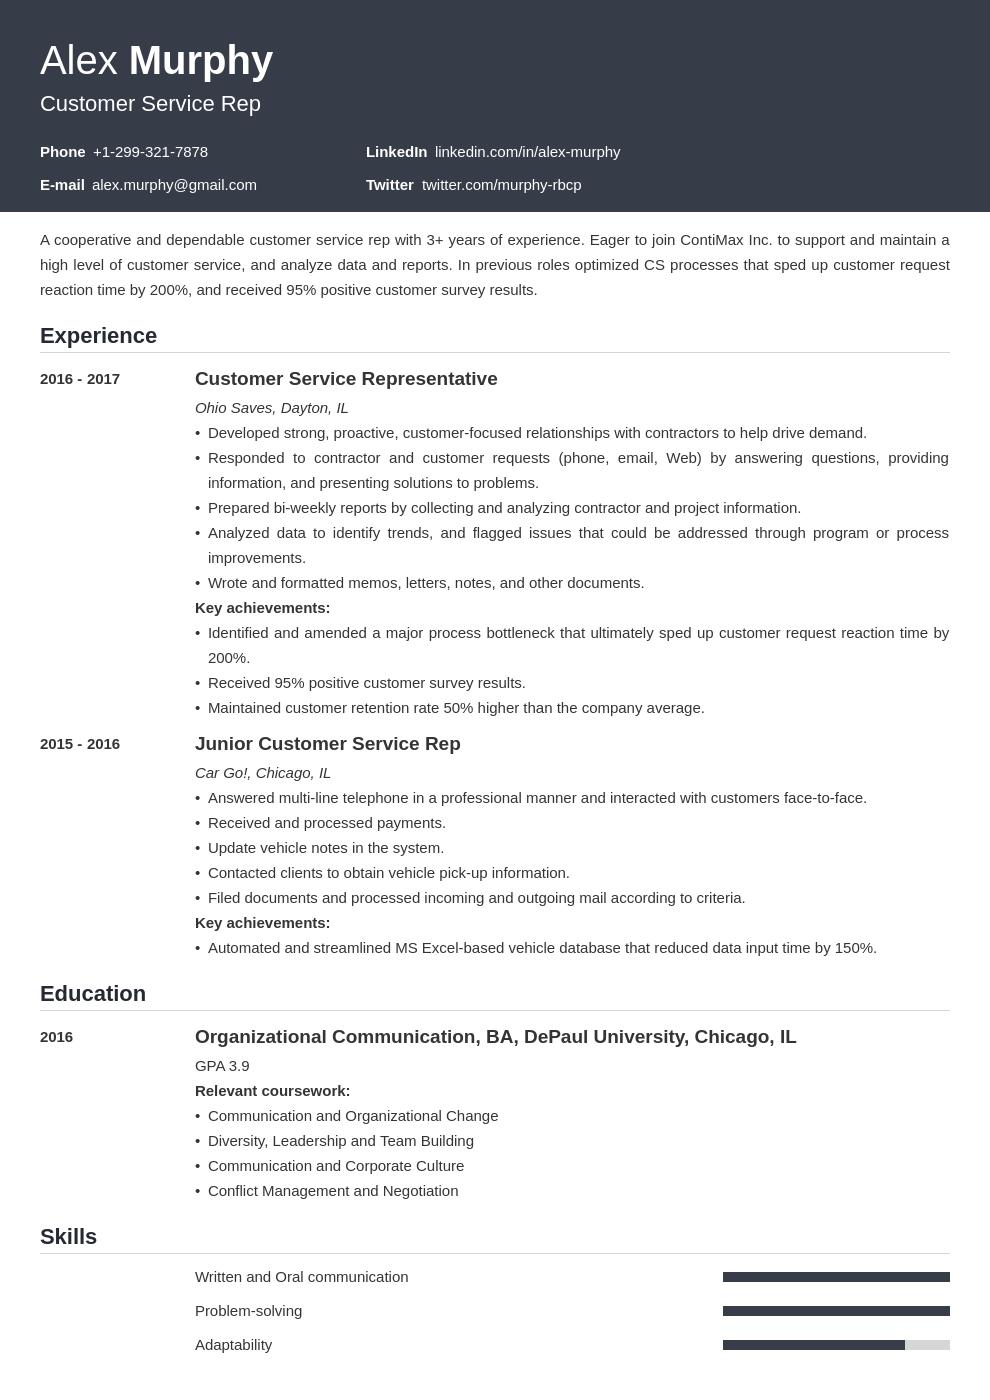 coursework resume